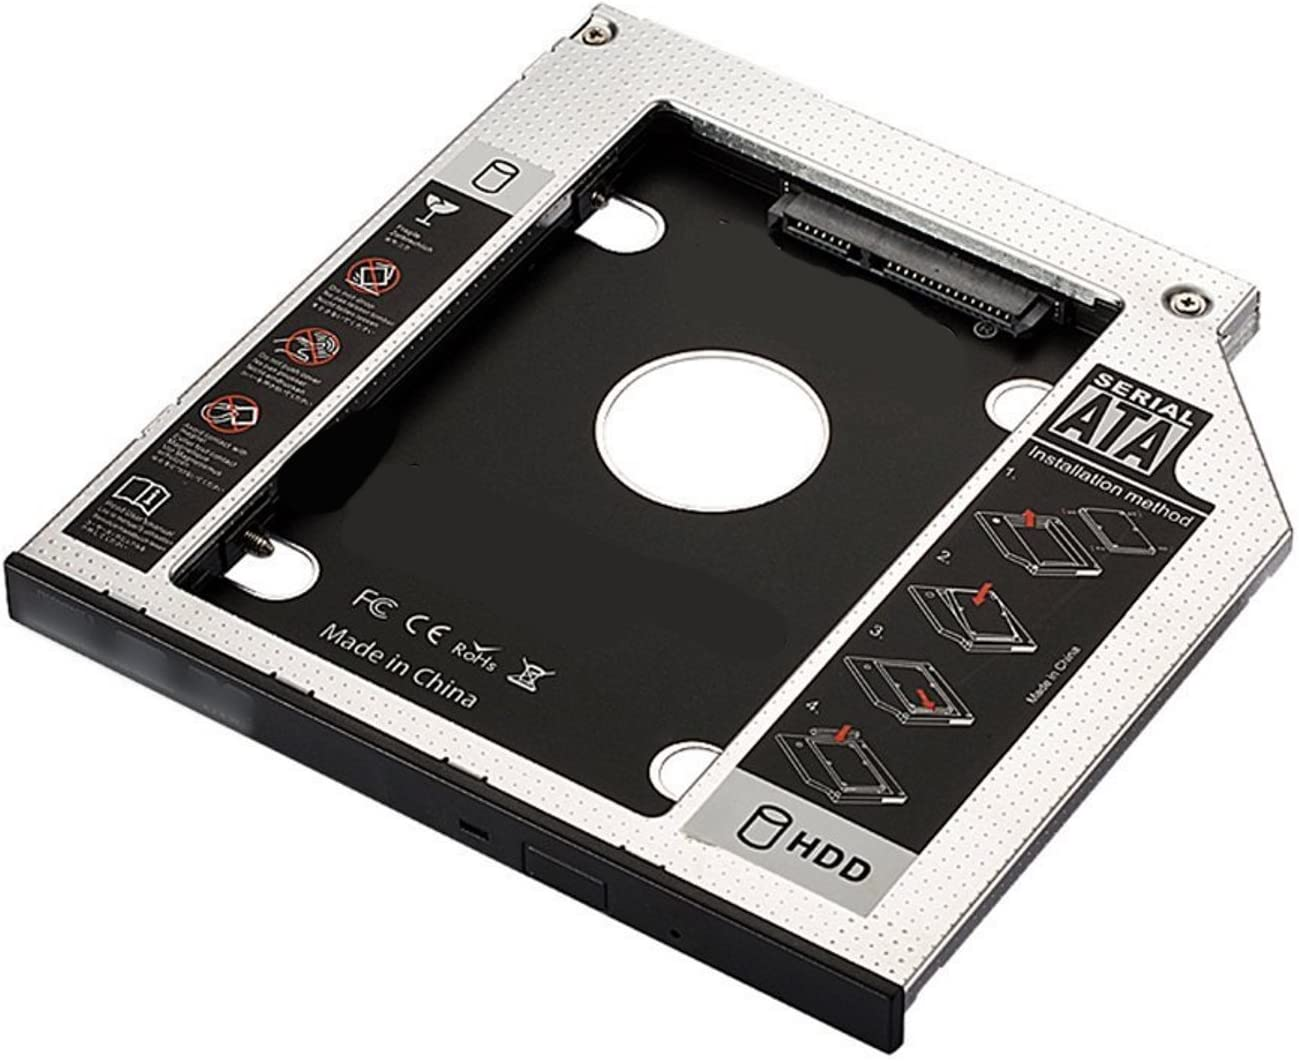 SATA III SSD/HDD Caja de instalación en Optical bahìa CD/DVD/BLU ...